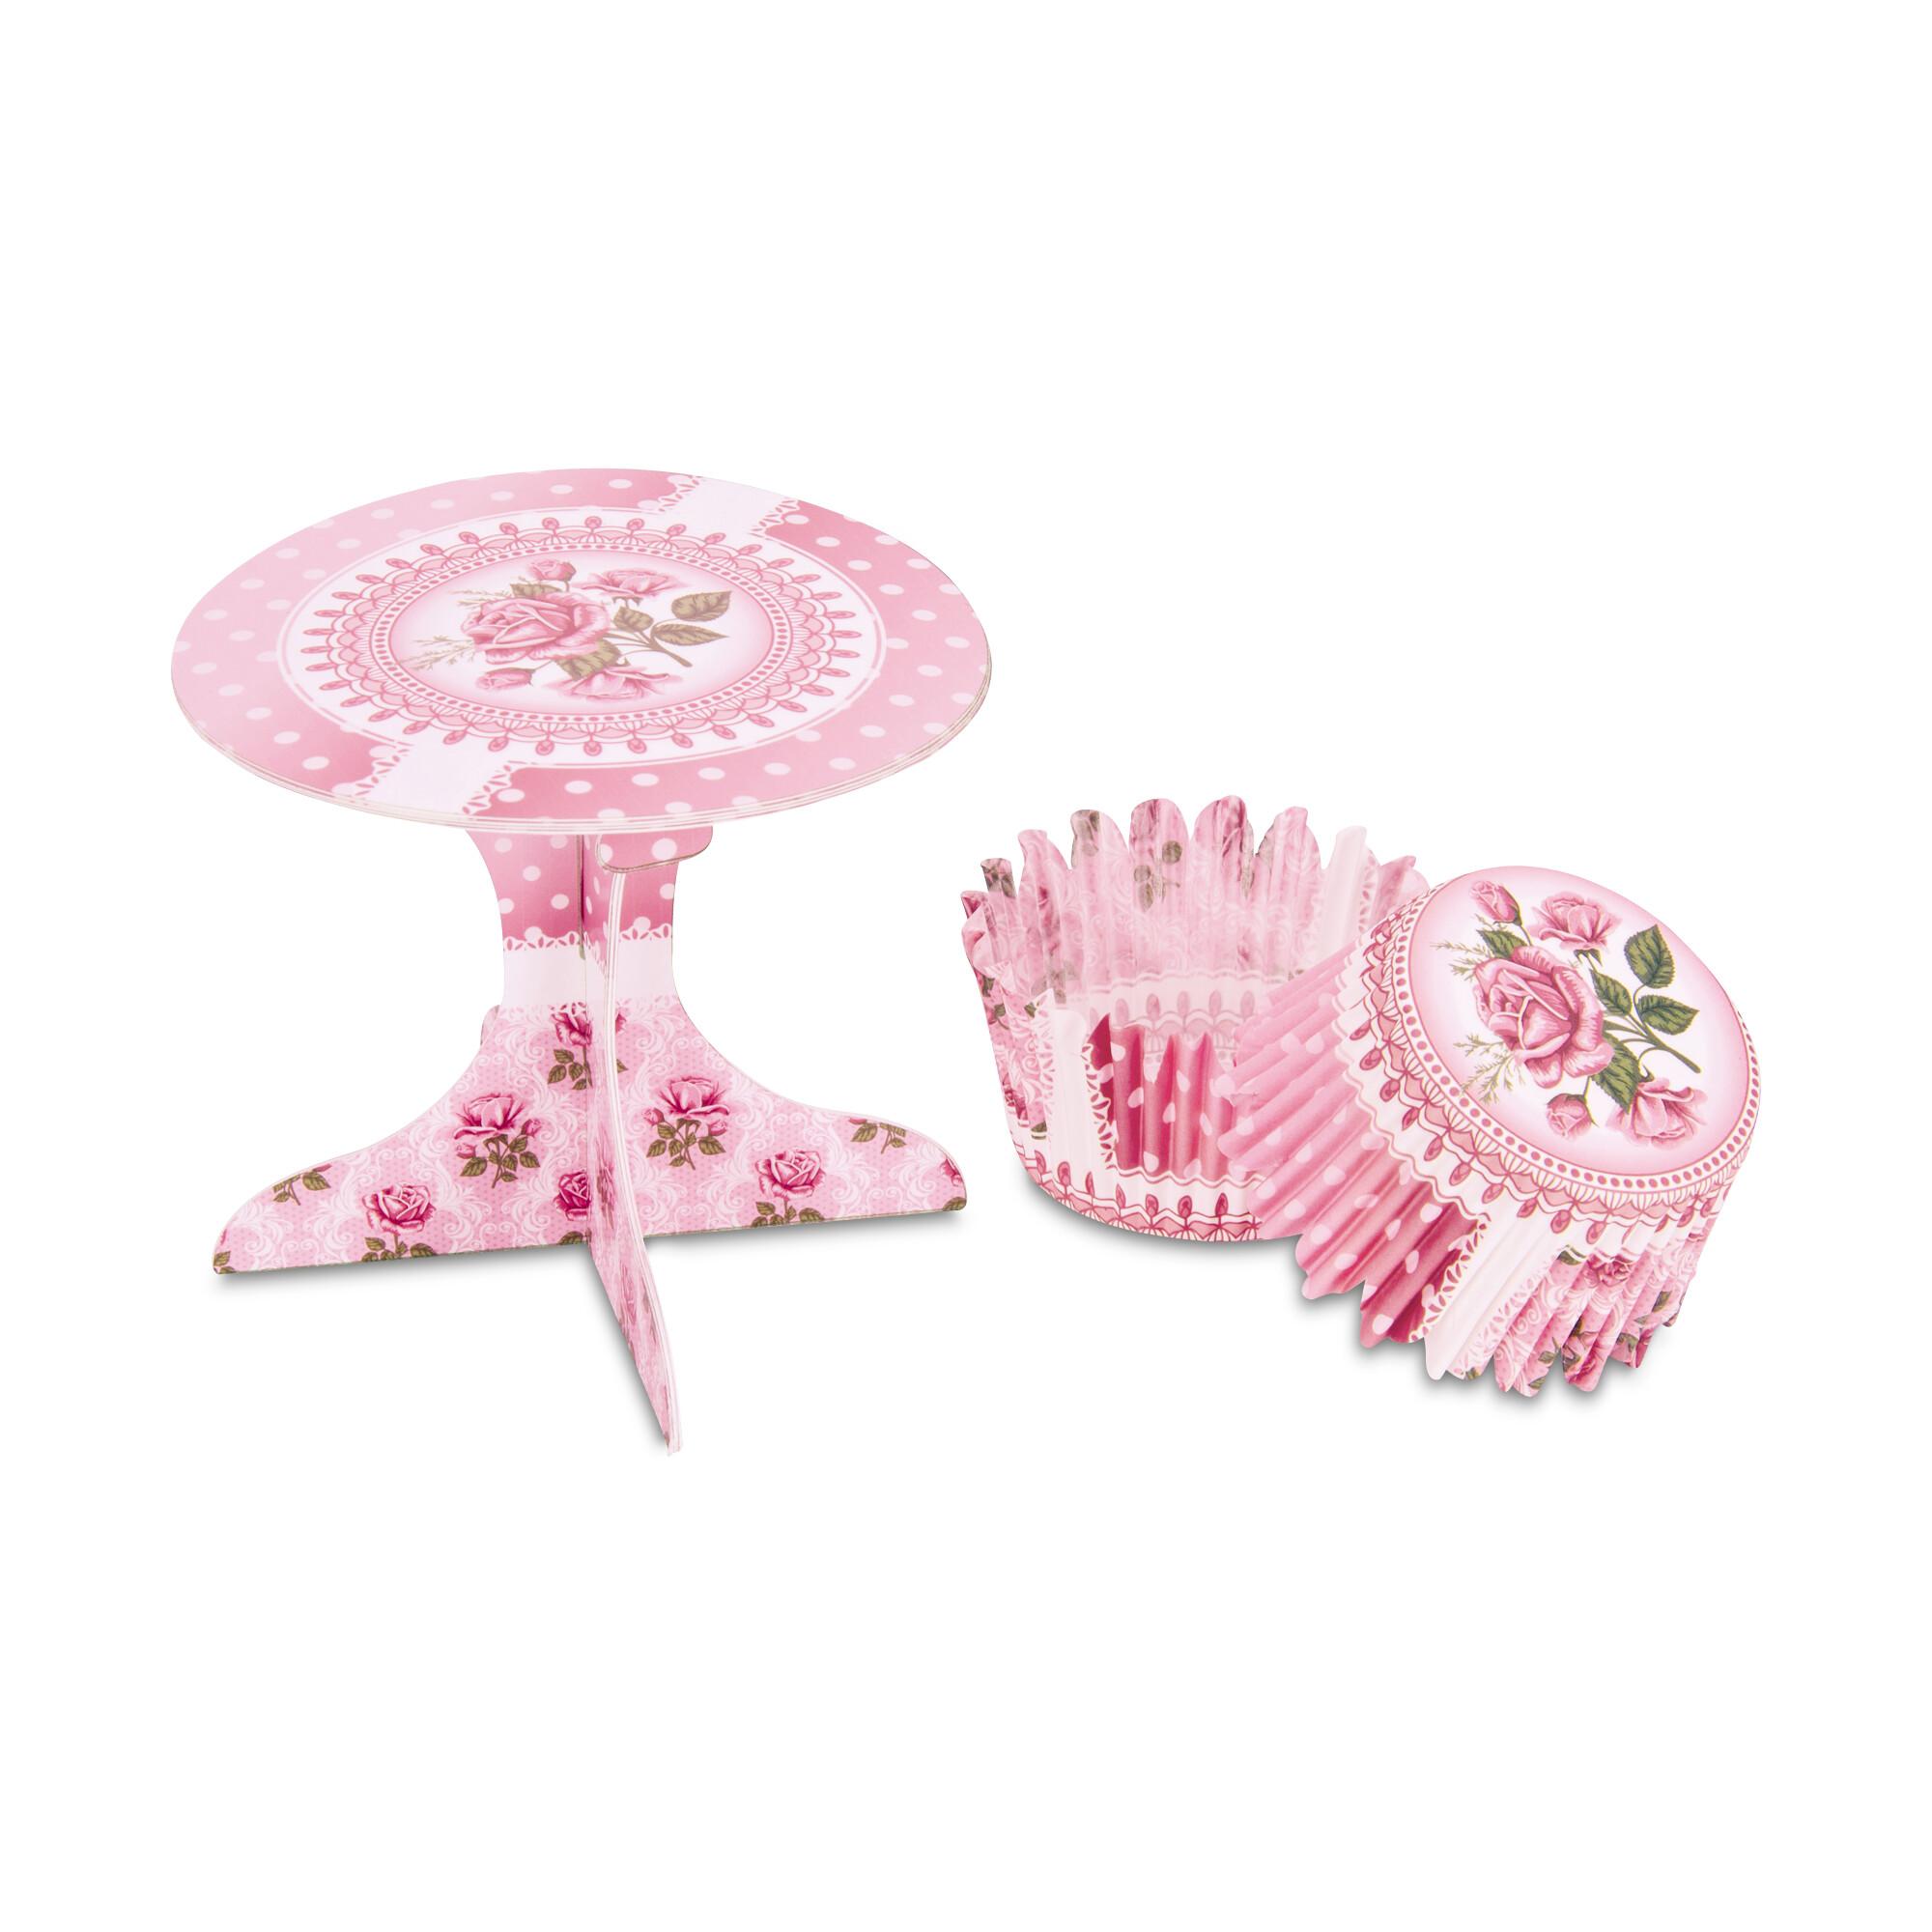 Cupcake deko - Rose garden - Set, 36 parts